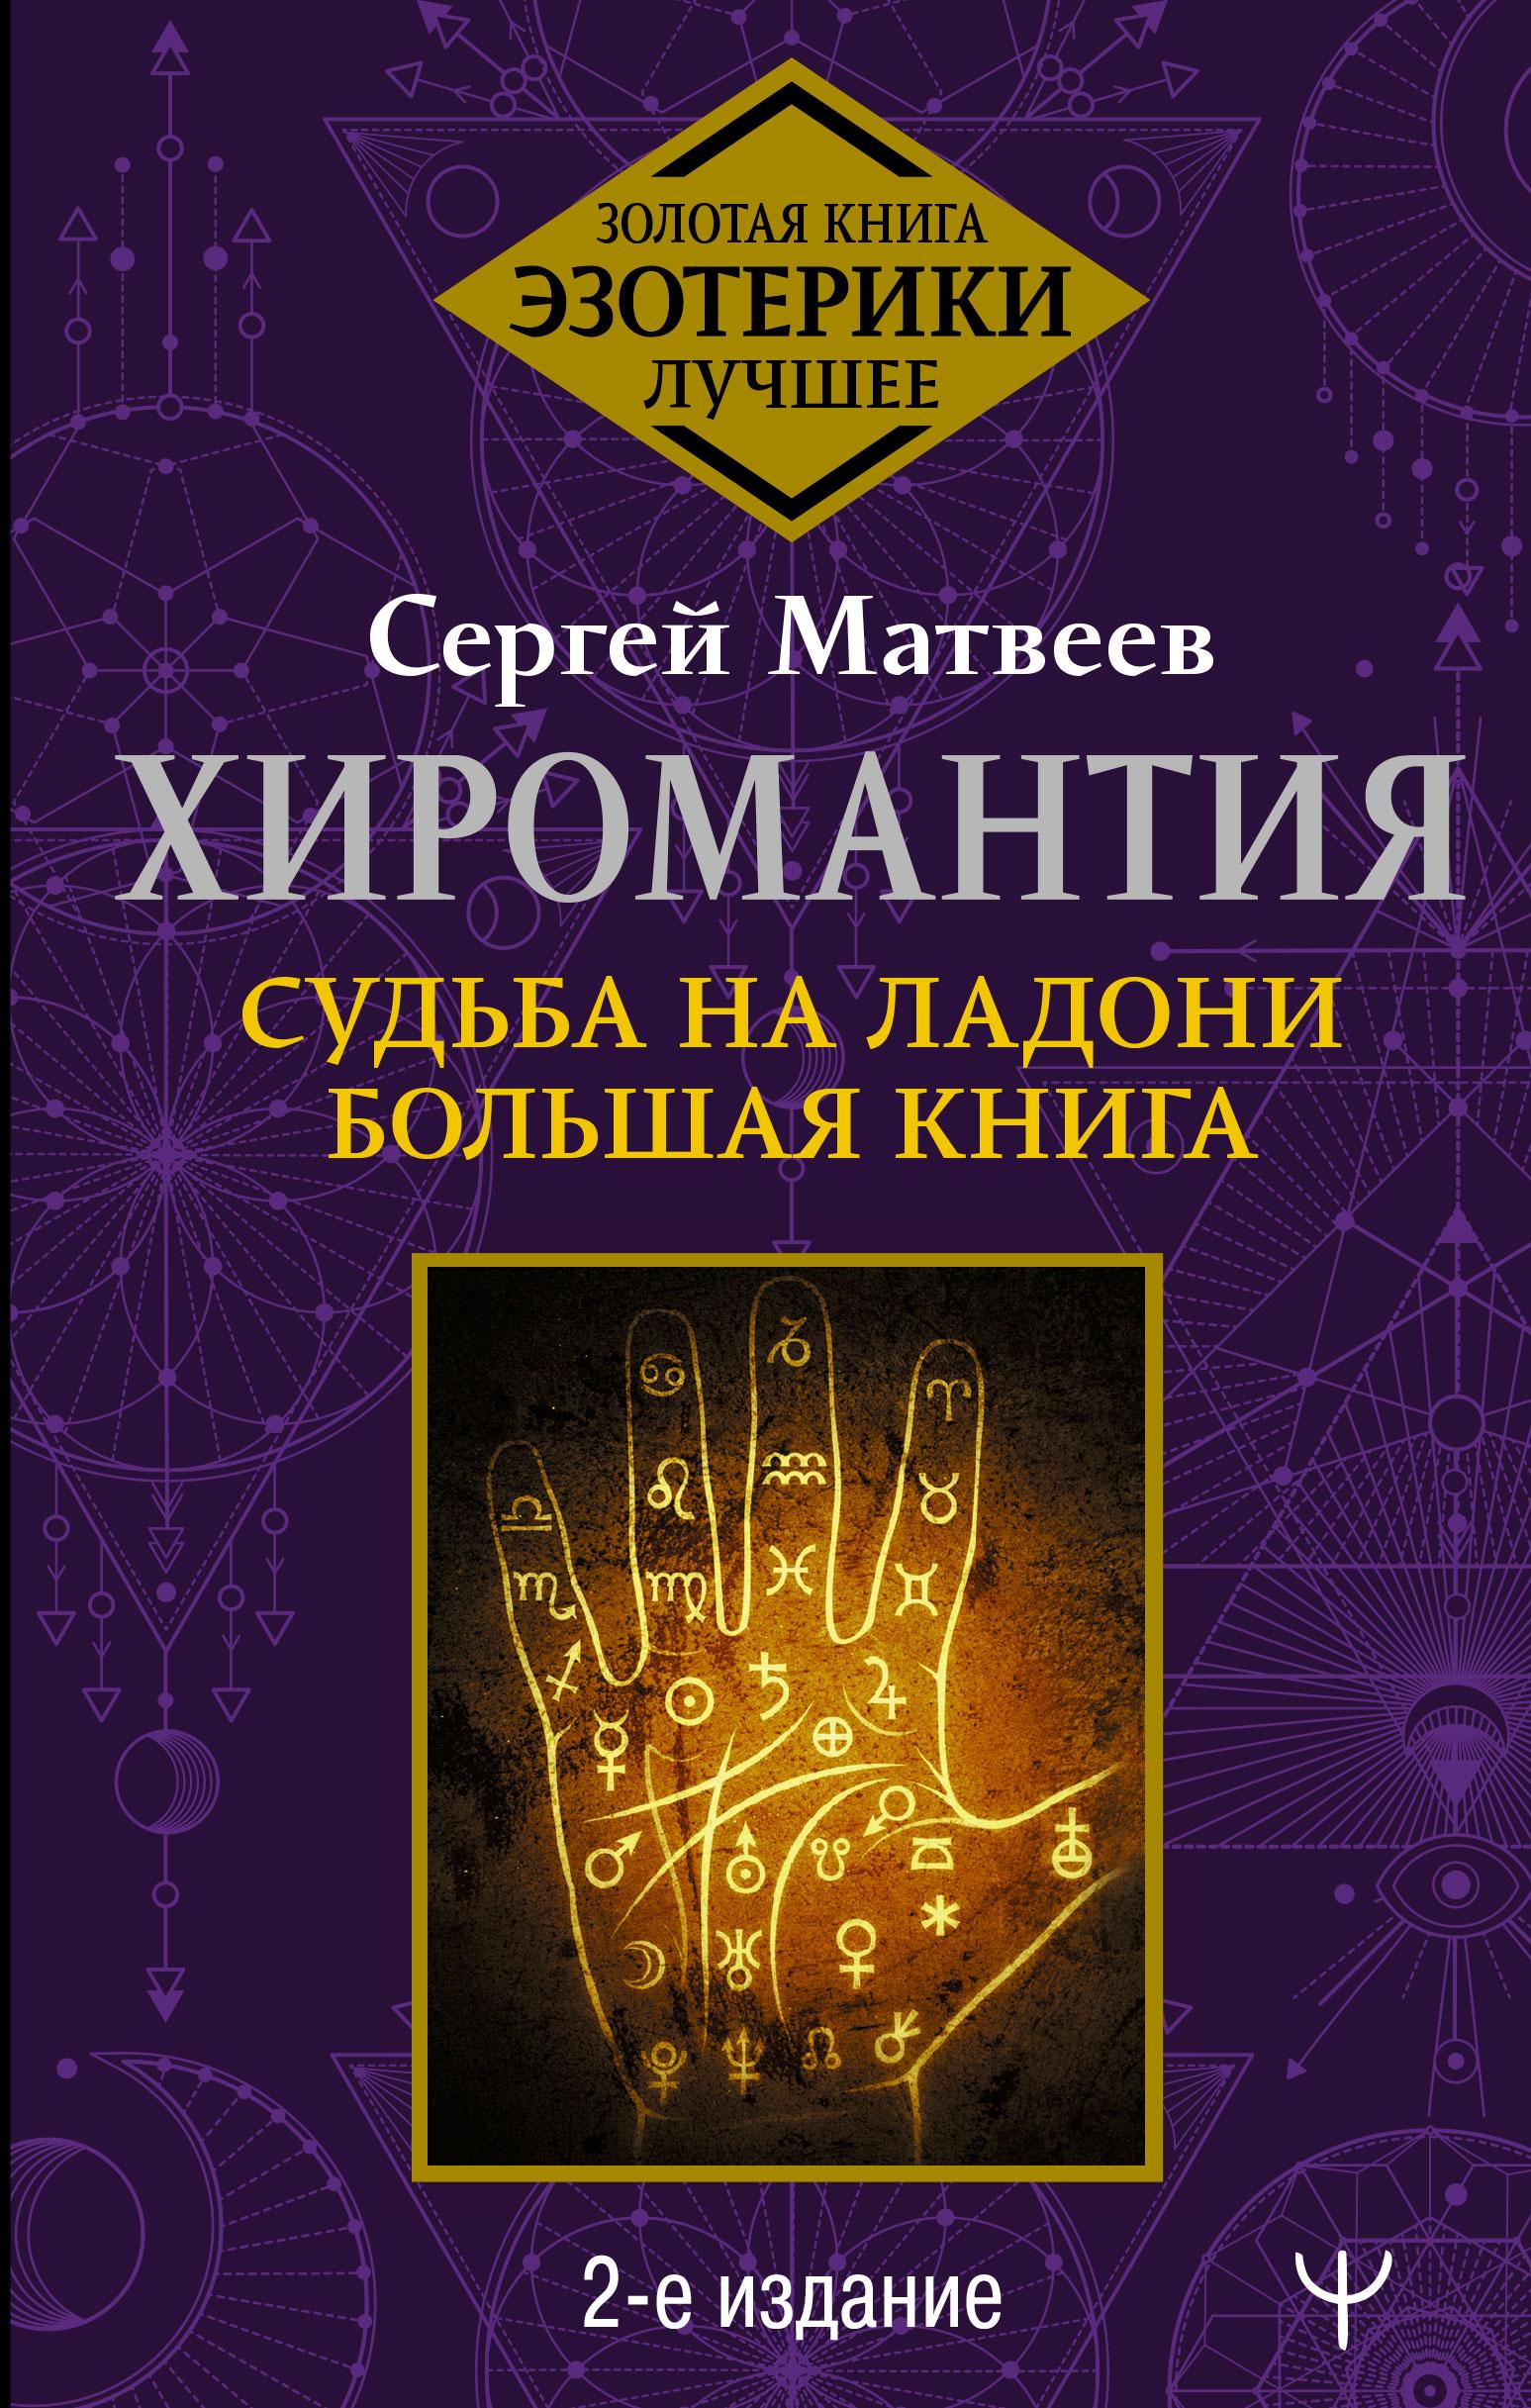 цена С. А. Матвеев Хиромантия. Большая книга чтения по ладони онлайн в 2017 году